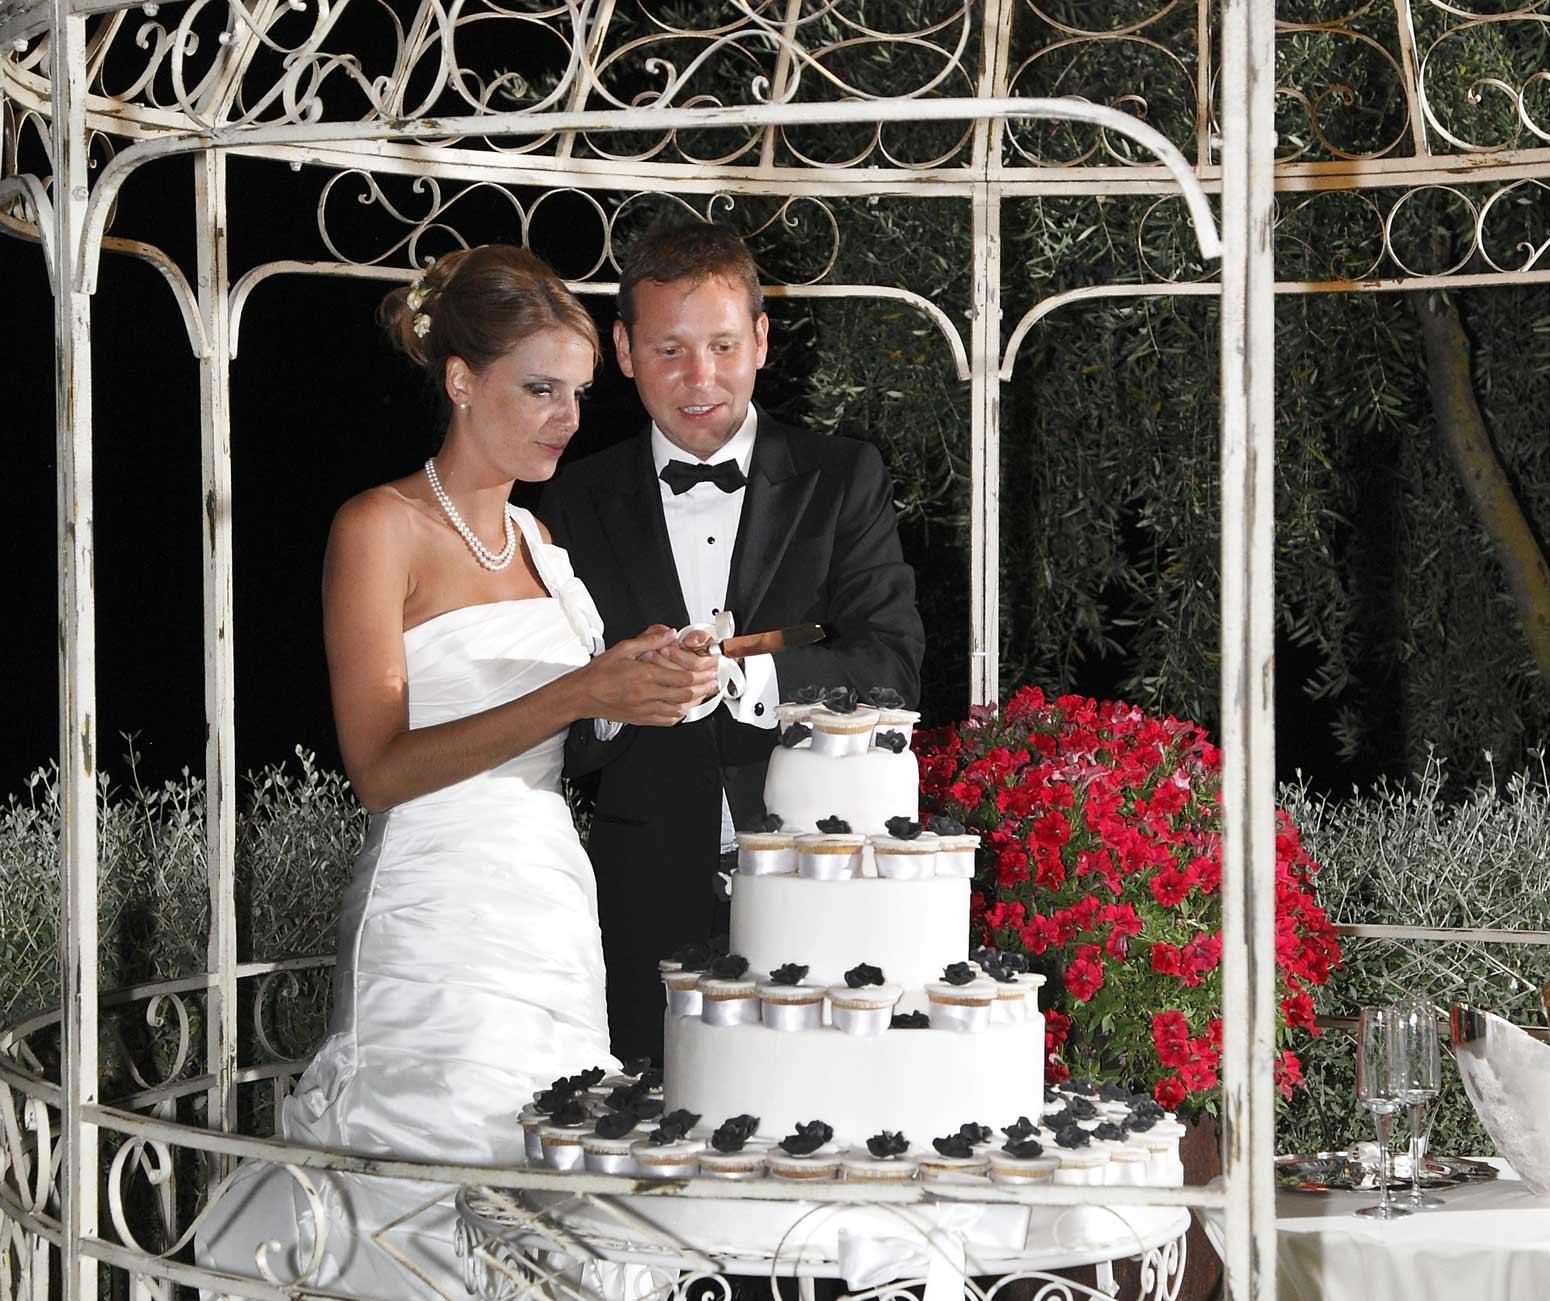 Ricevimento Matrimonio Toscana : Location per matrimoni toscana ricevimento nozze